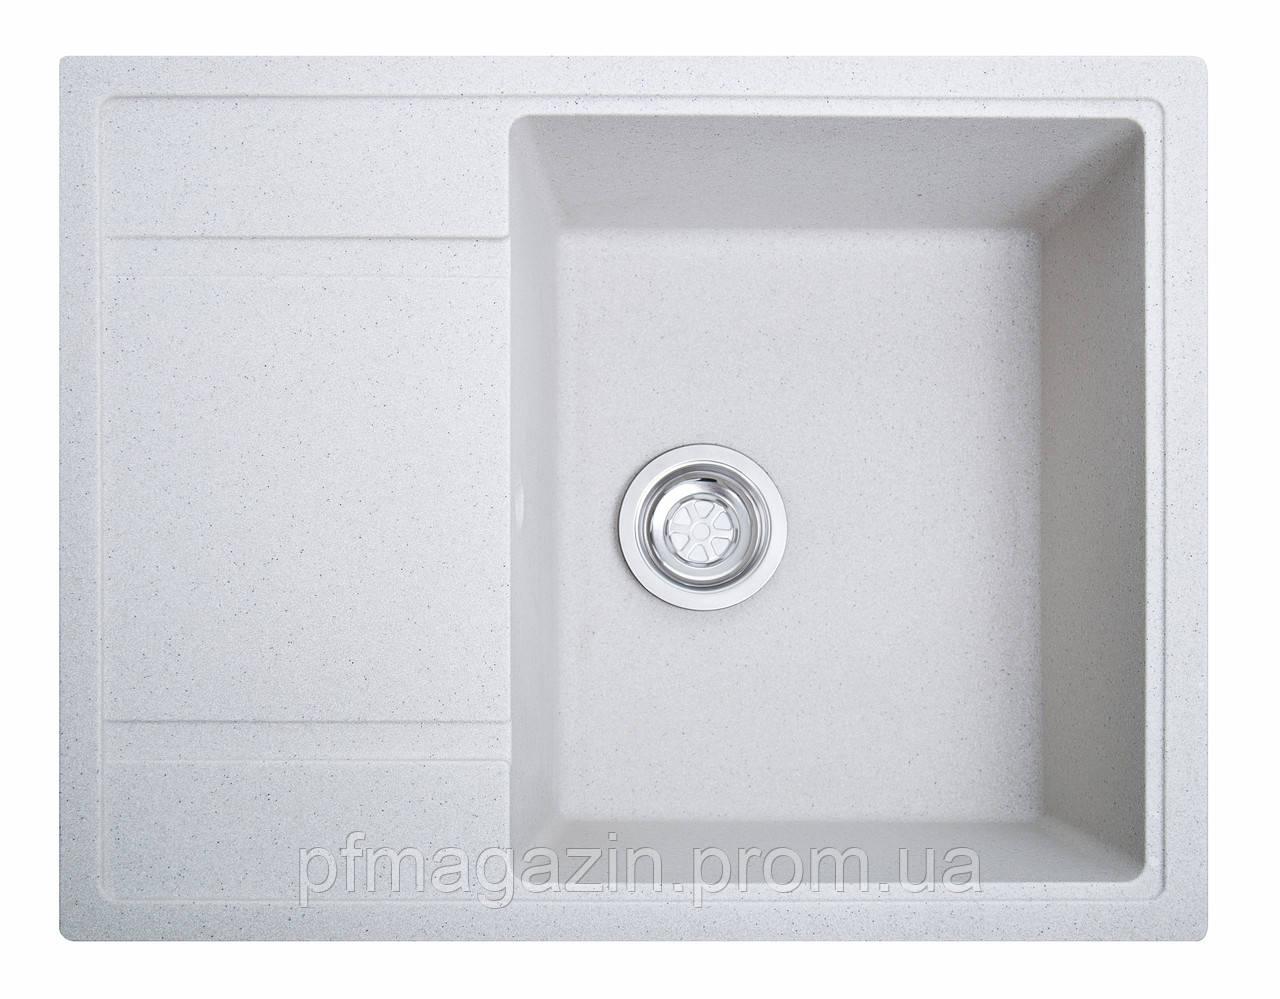 Мийка кухонна Оптима, колір - білий (ДхШхГ-650х510х200)